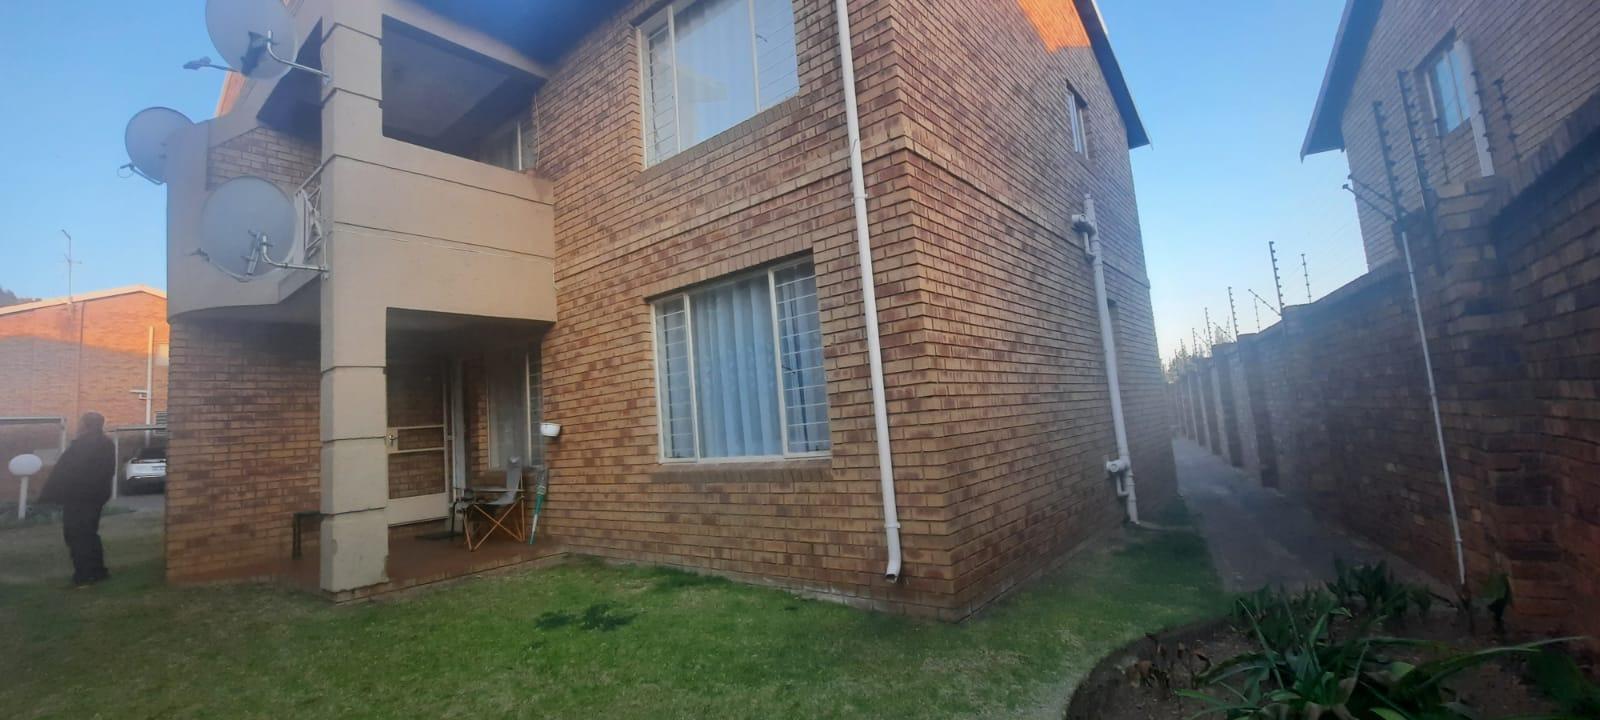 House For Sale in Kenleaf